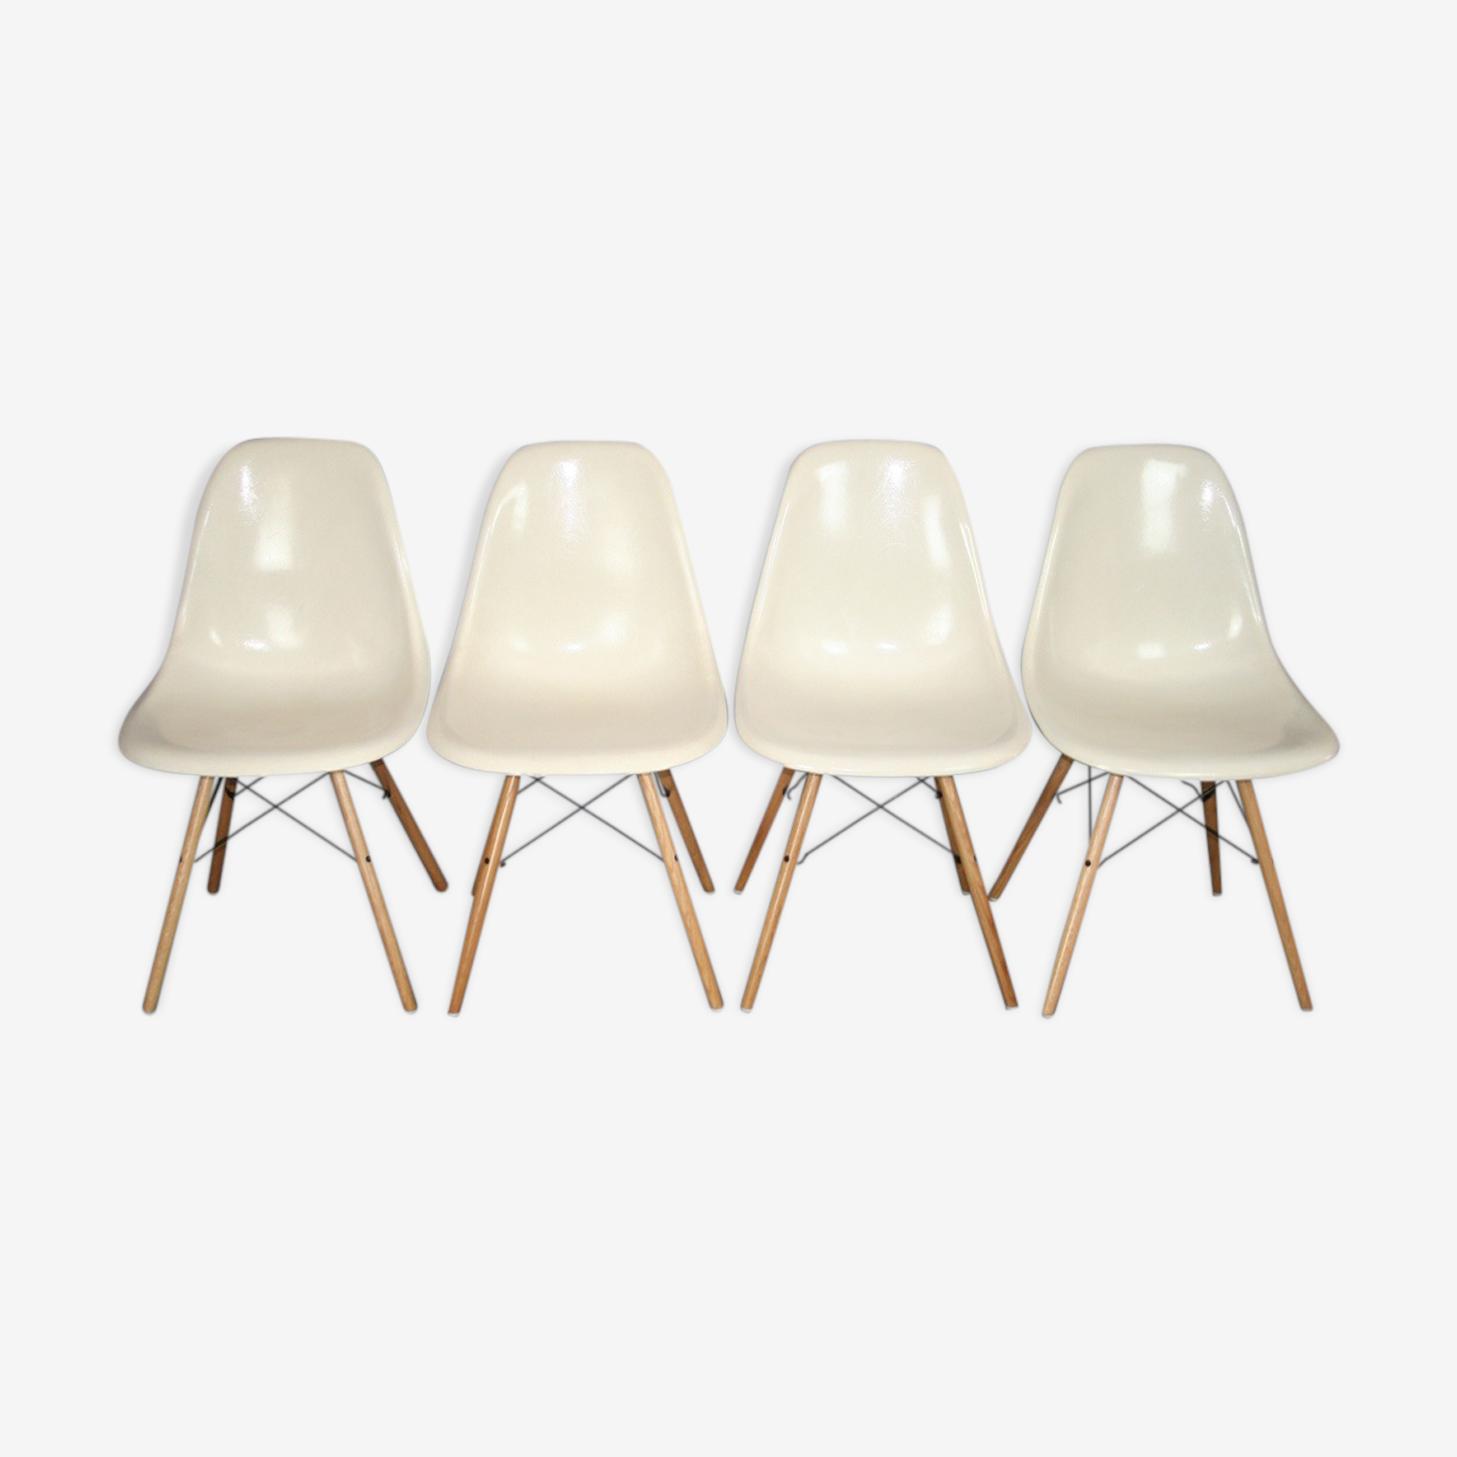 4 chaises dsw Eames Herman Miller